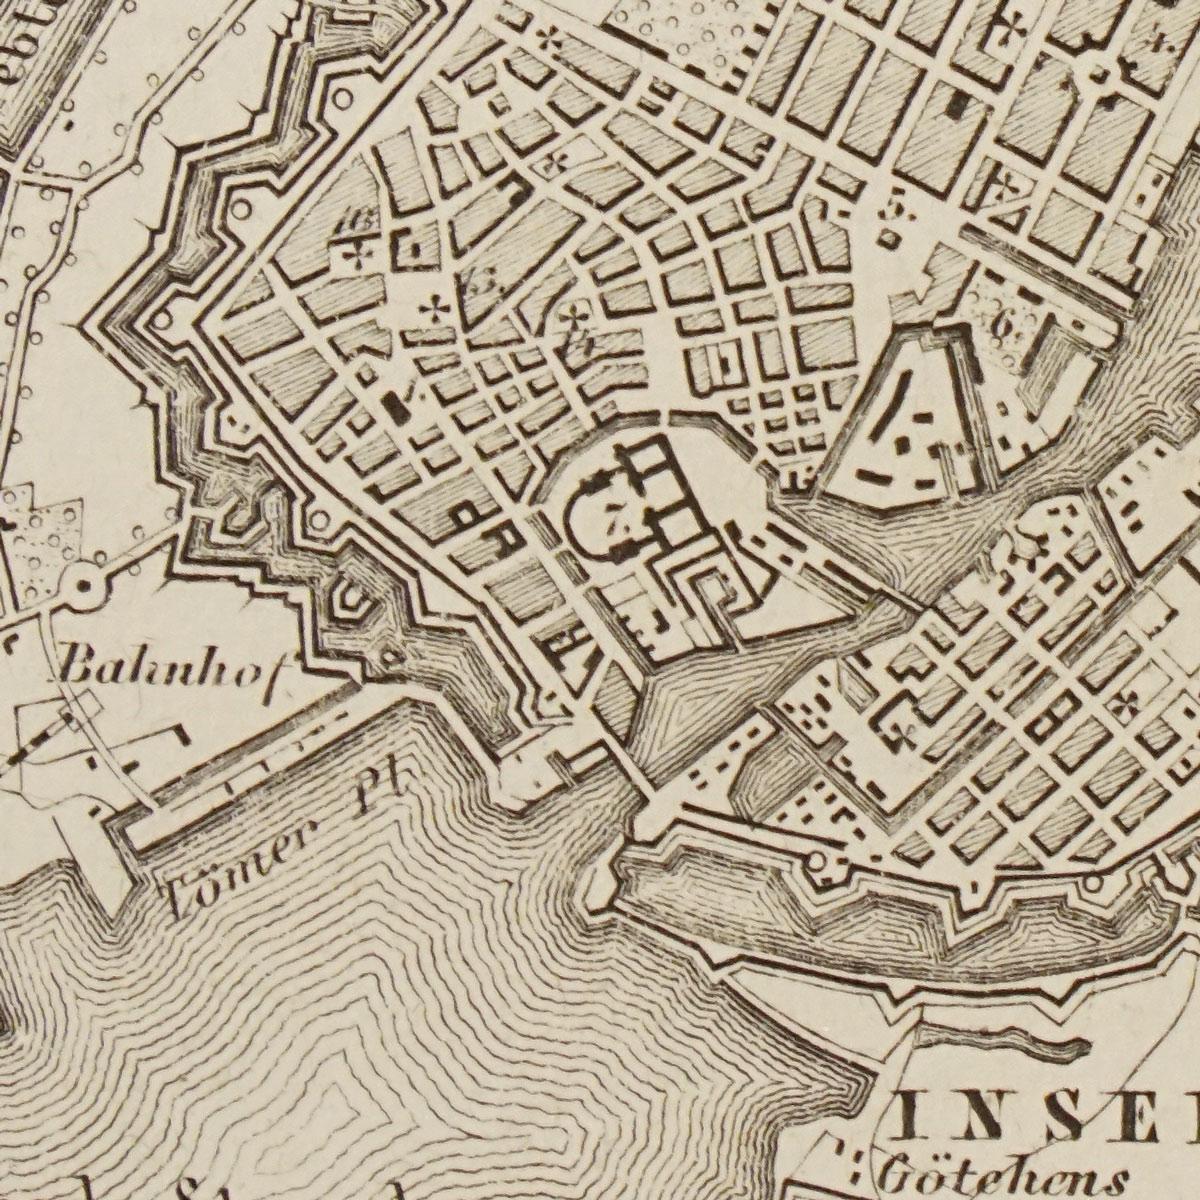 "Plan of Copenhagen from Kieperts ""Grosser Handatlas der Erde und des Himmels"" side map dated 1872"